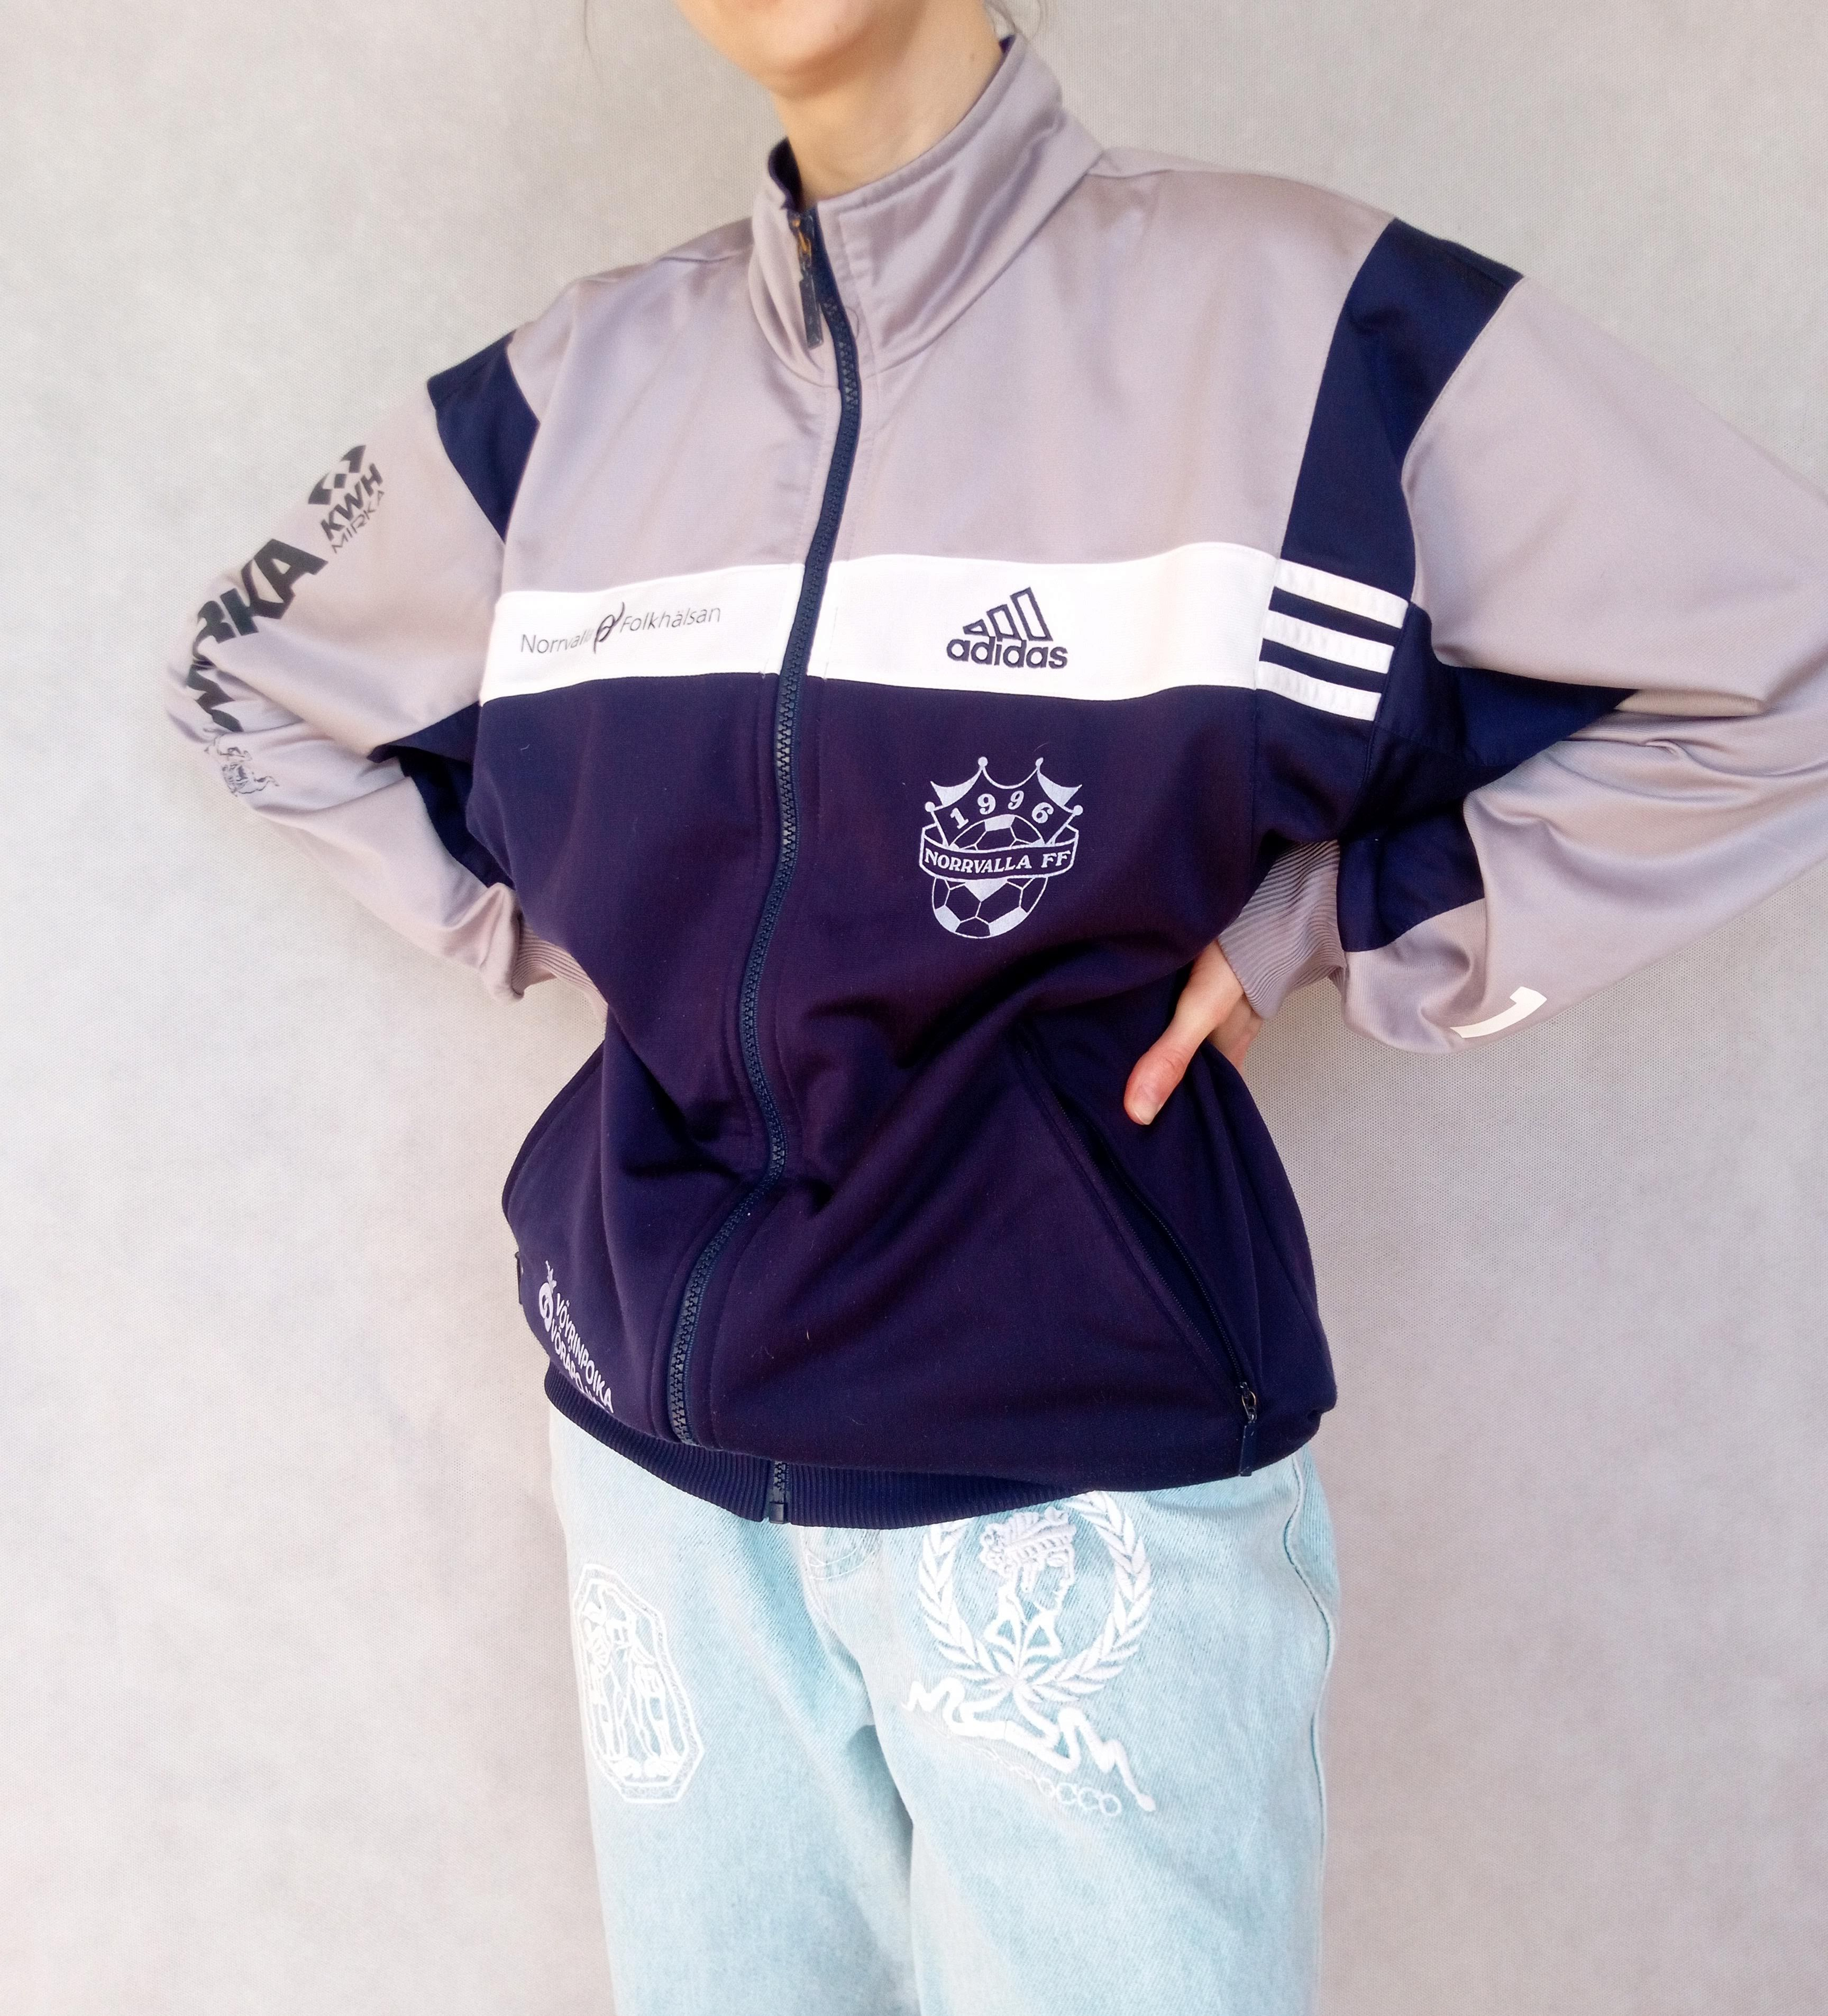 Vintage Adidas Pullover Navy Blue Adidas Hoodie Large Womens Sweats Retro Adidas Sweater 90s Adidas Sweatshirt 3 Stripe Jumper Adidas Pullover Adidas Sweater Blue Adidas [ 3811 x 3456 Pixel ]